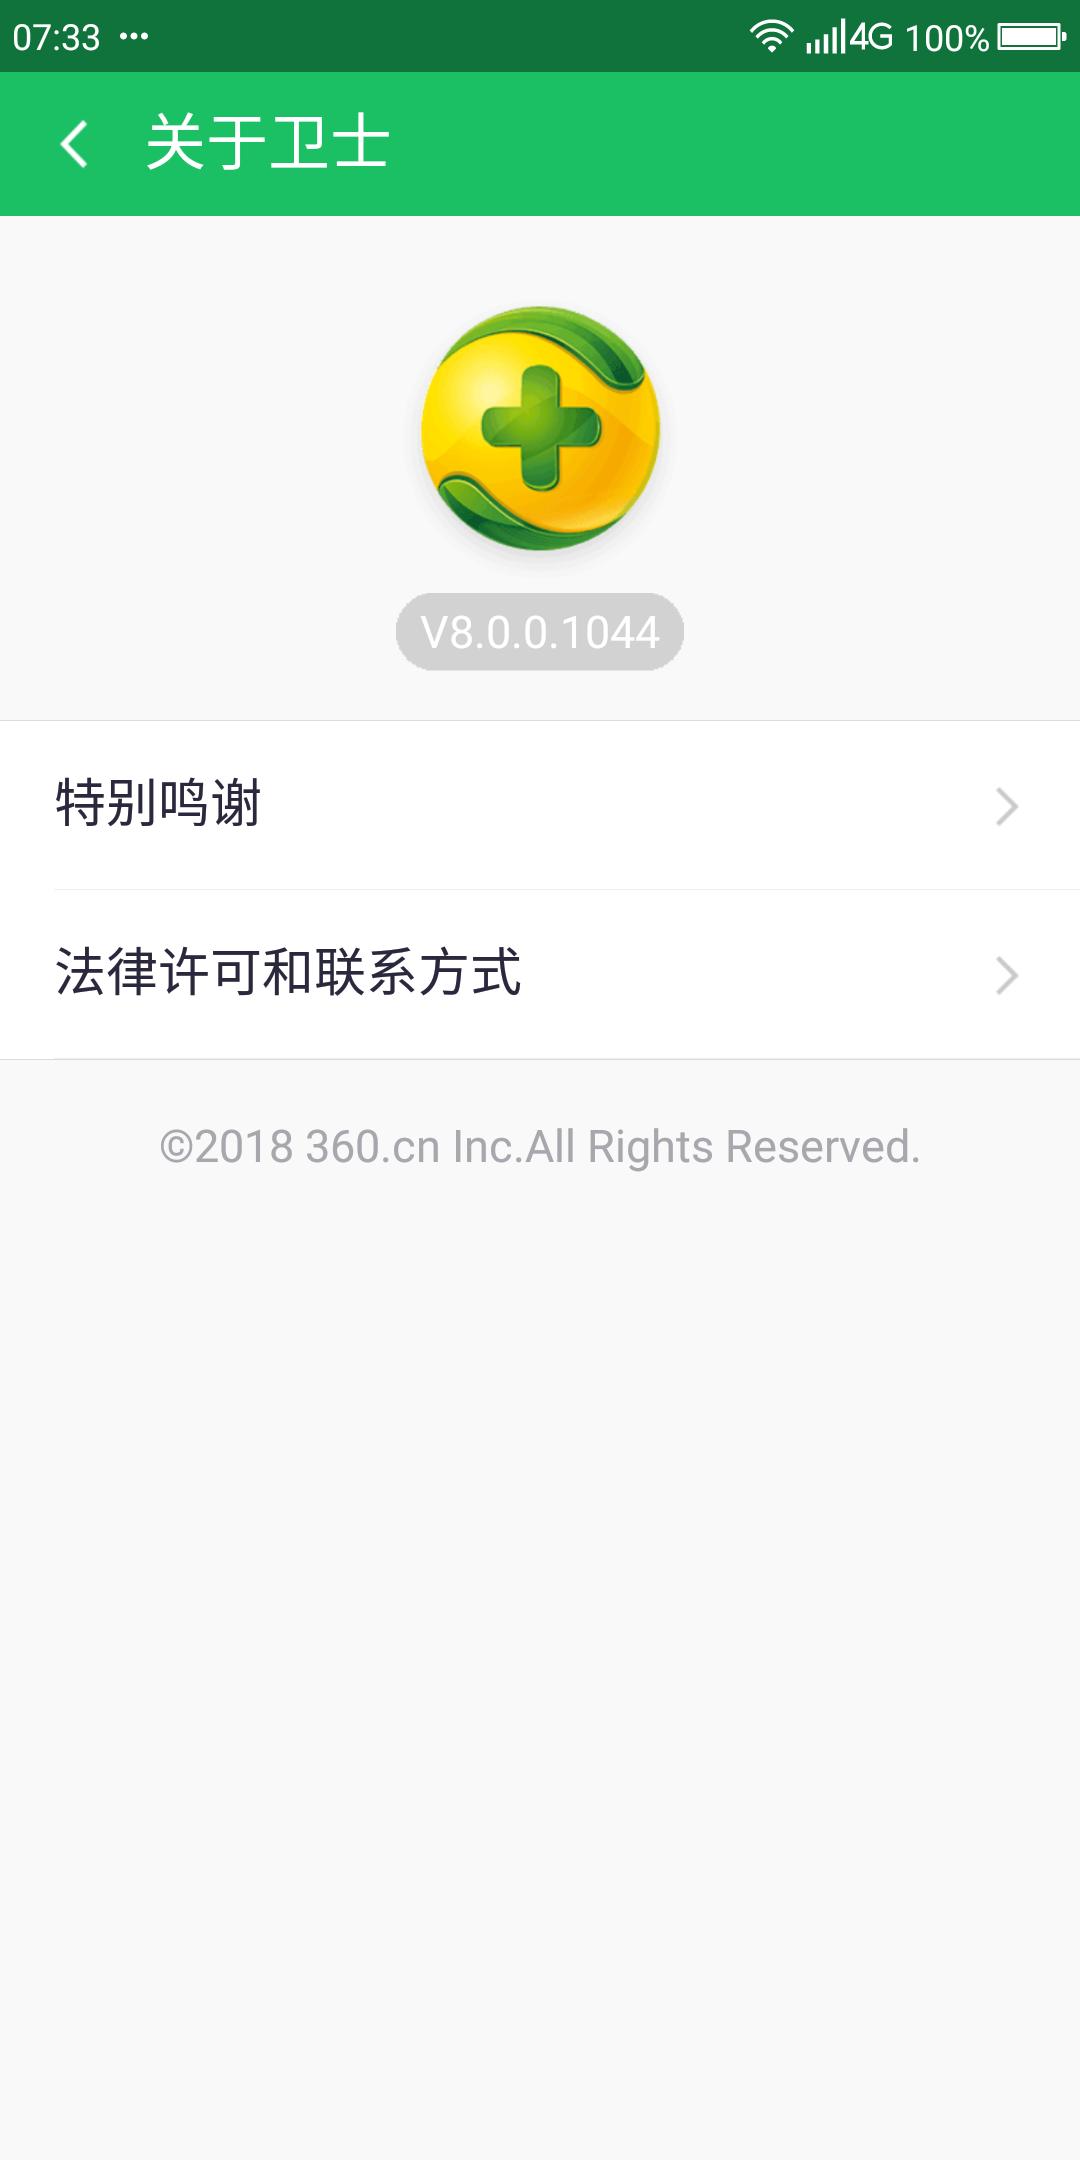 Screenshot_2019-02-07-07-33-36.png